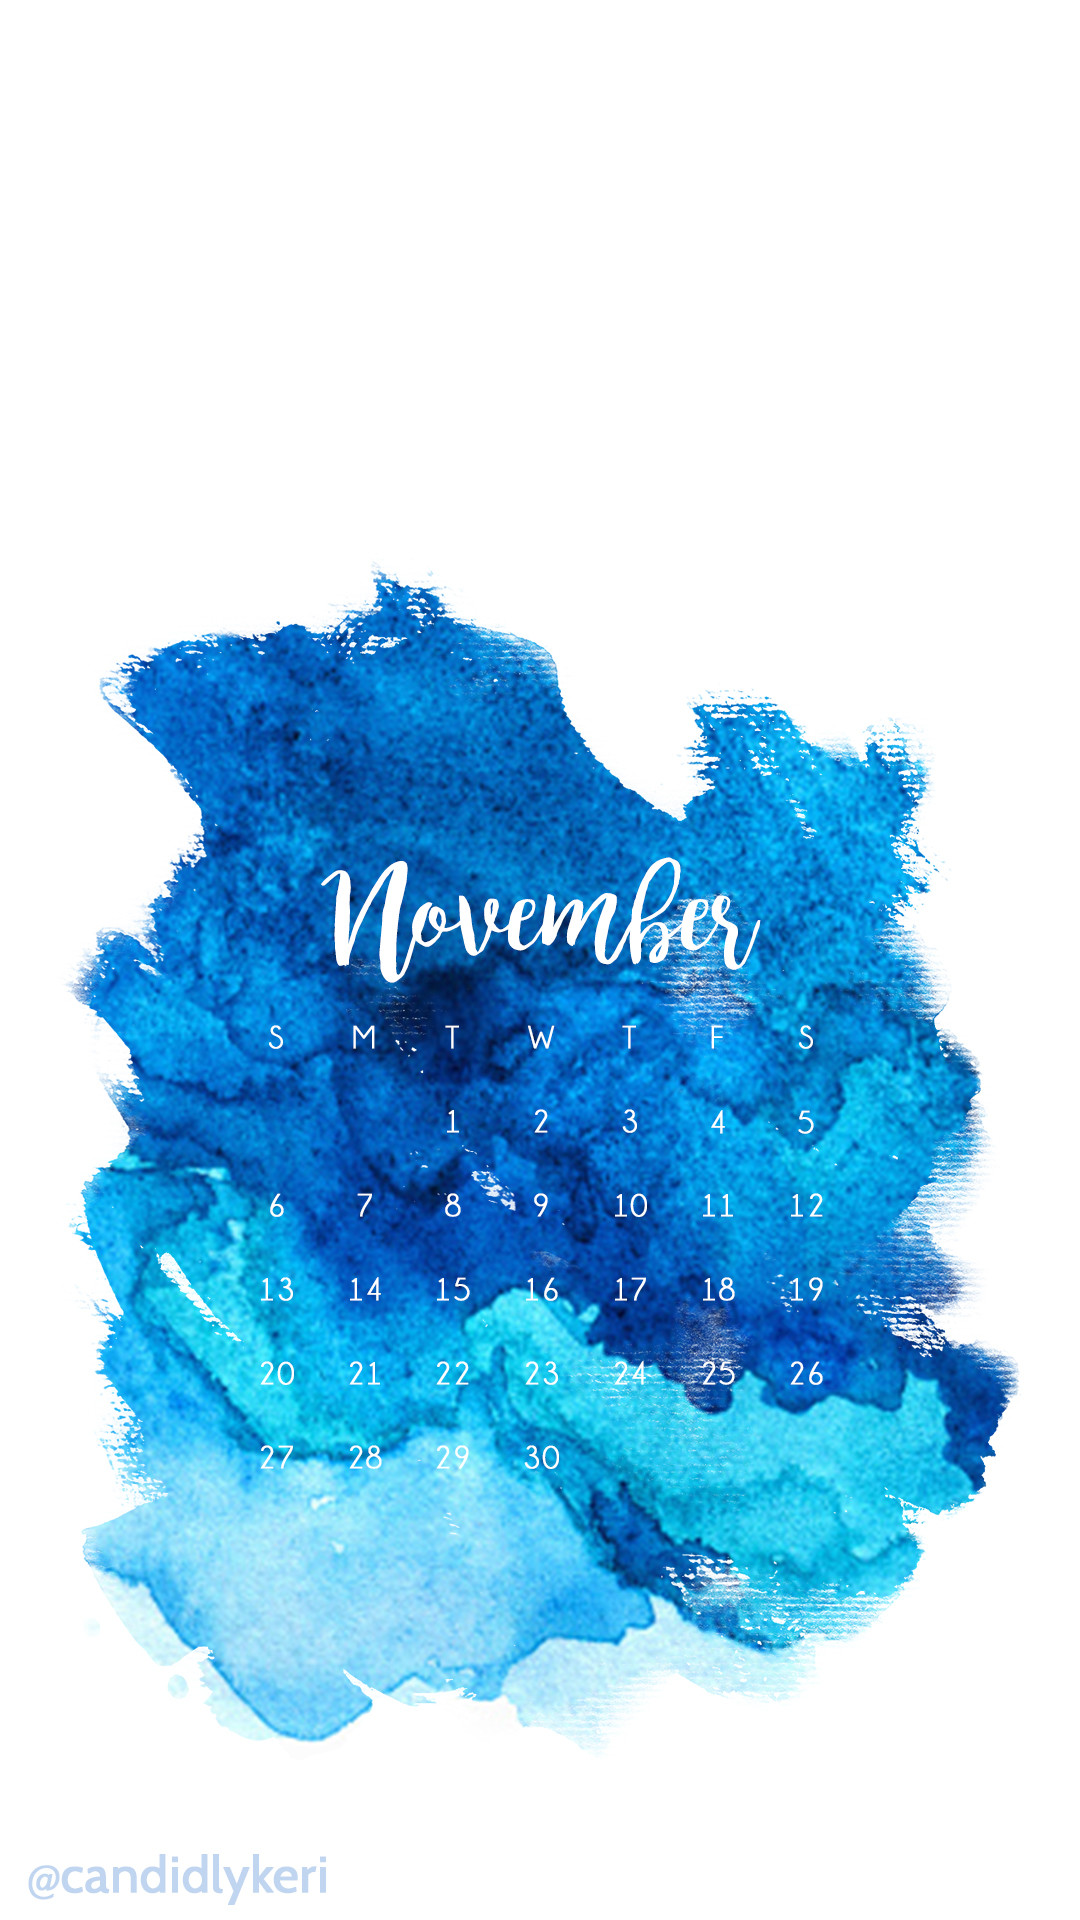 Dark Blue light Blue ocean Watercolor November calendar 2016 wallpaper you  can download for free on